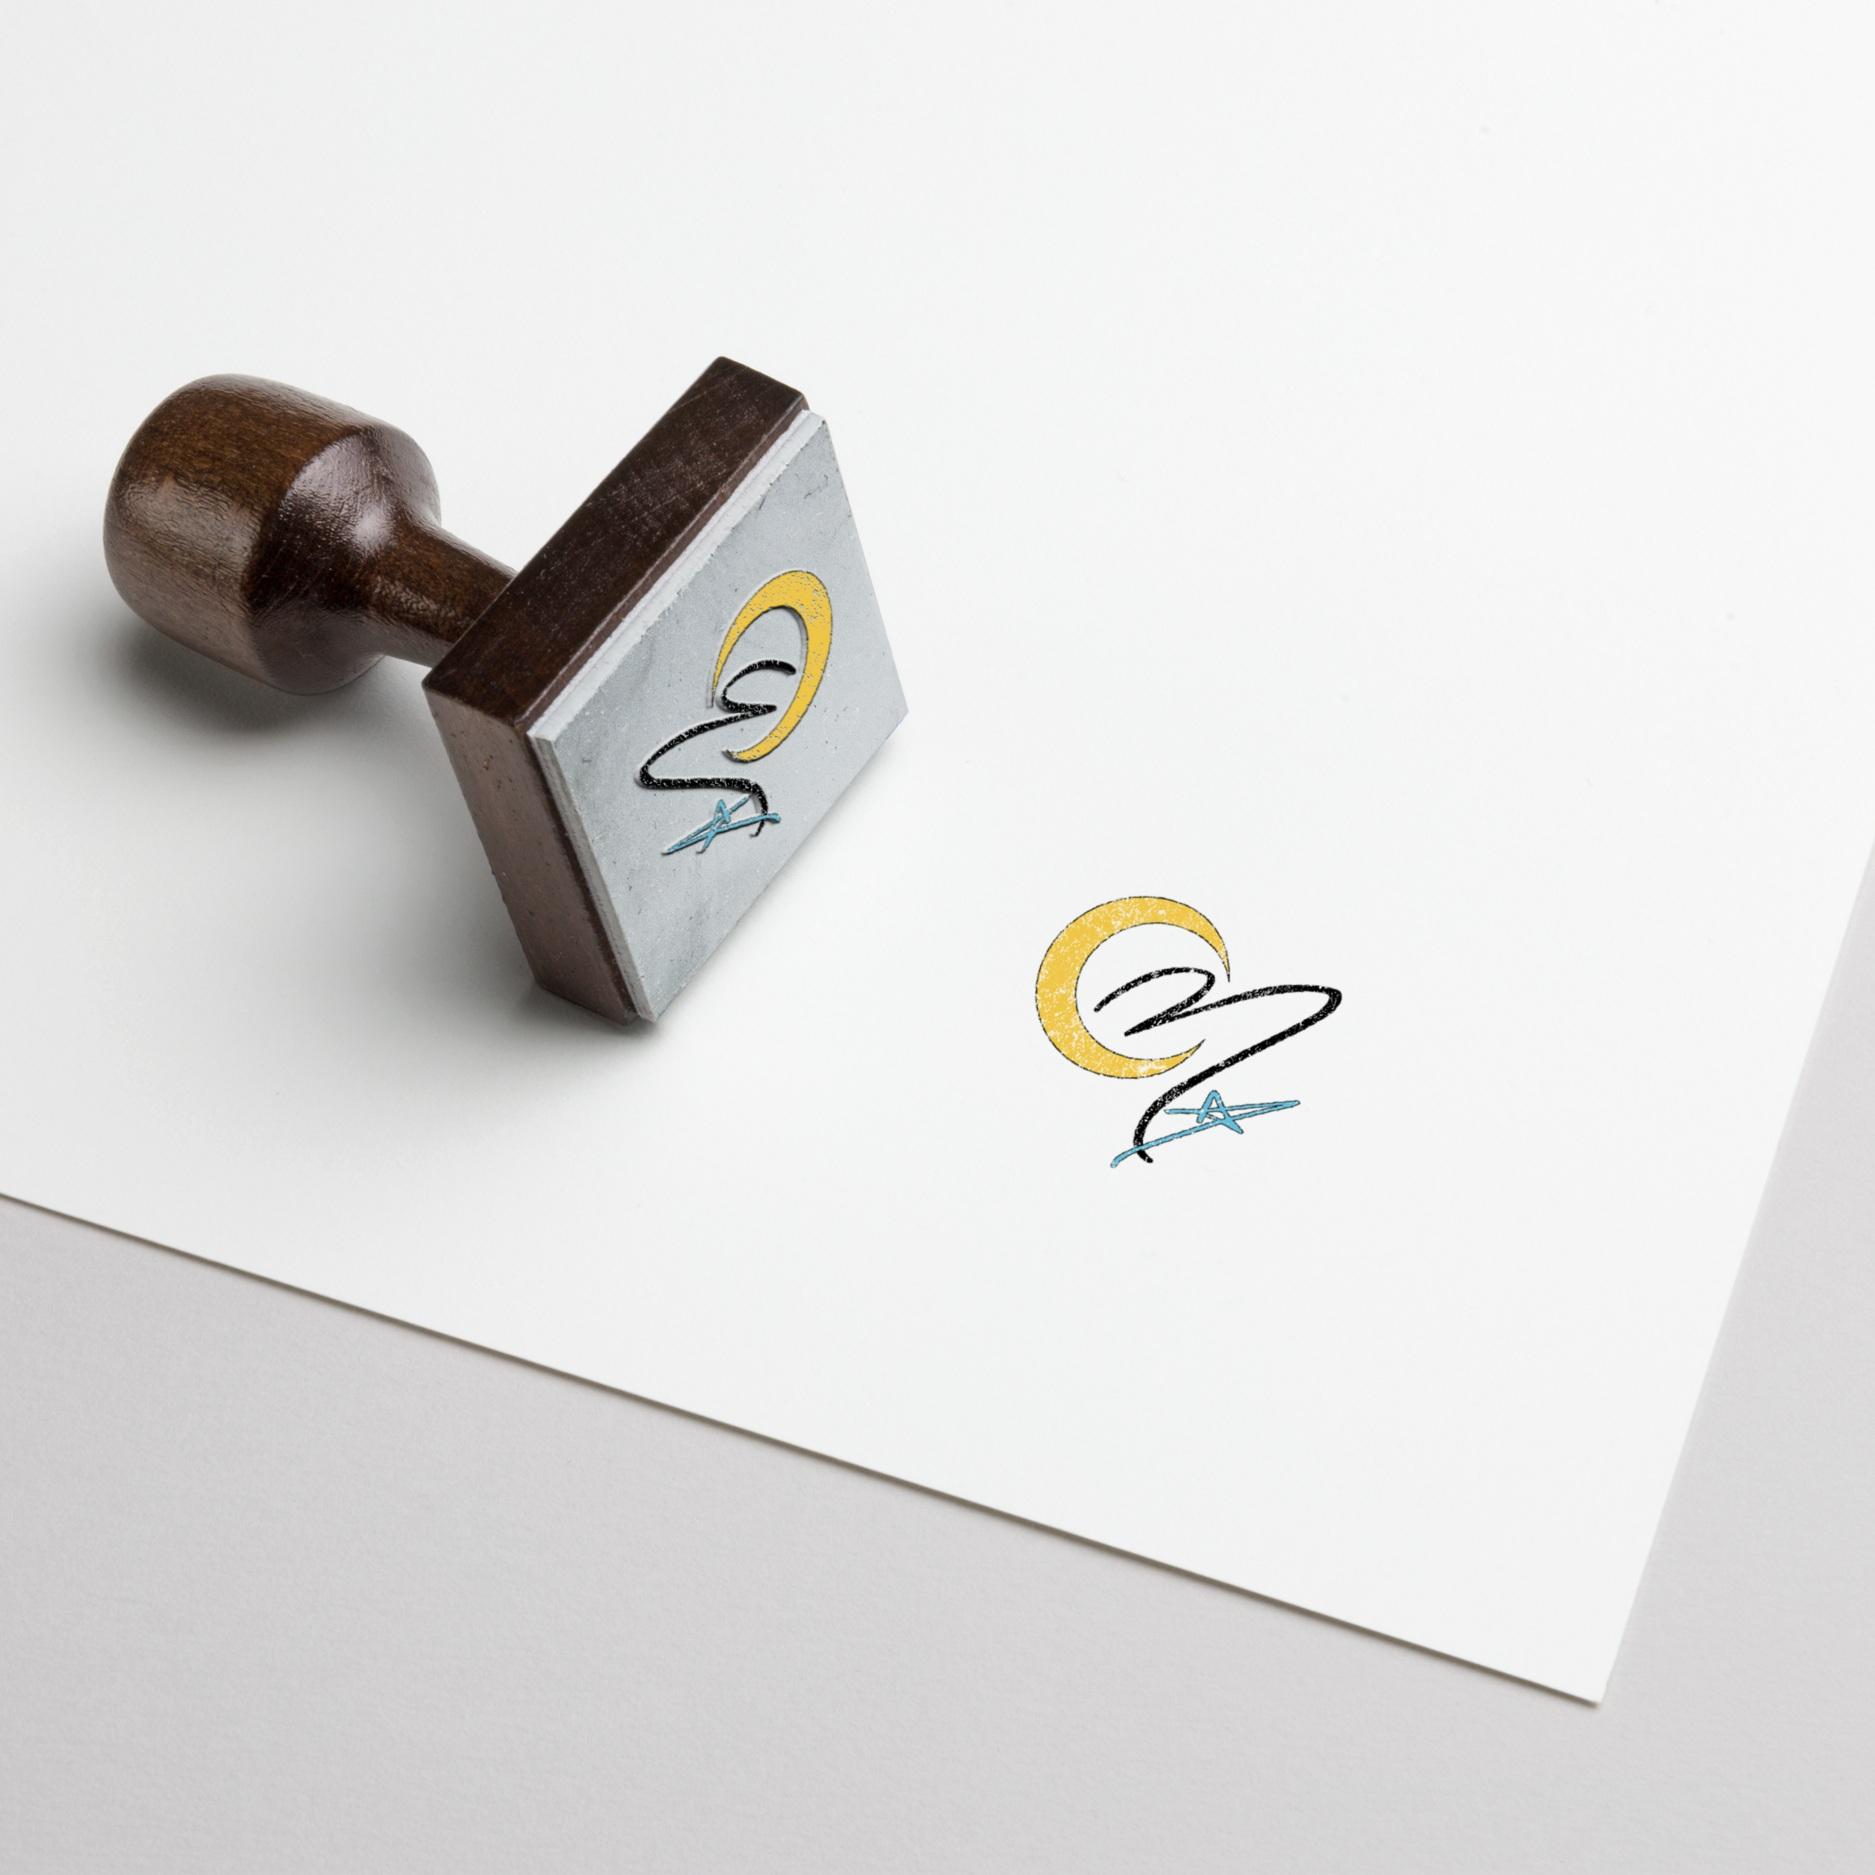 Rubber+Stamp+PSD+MockUp+3+%282%29.jpg